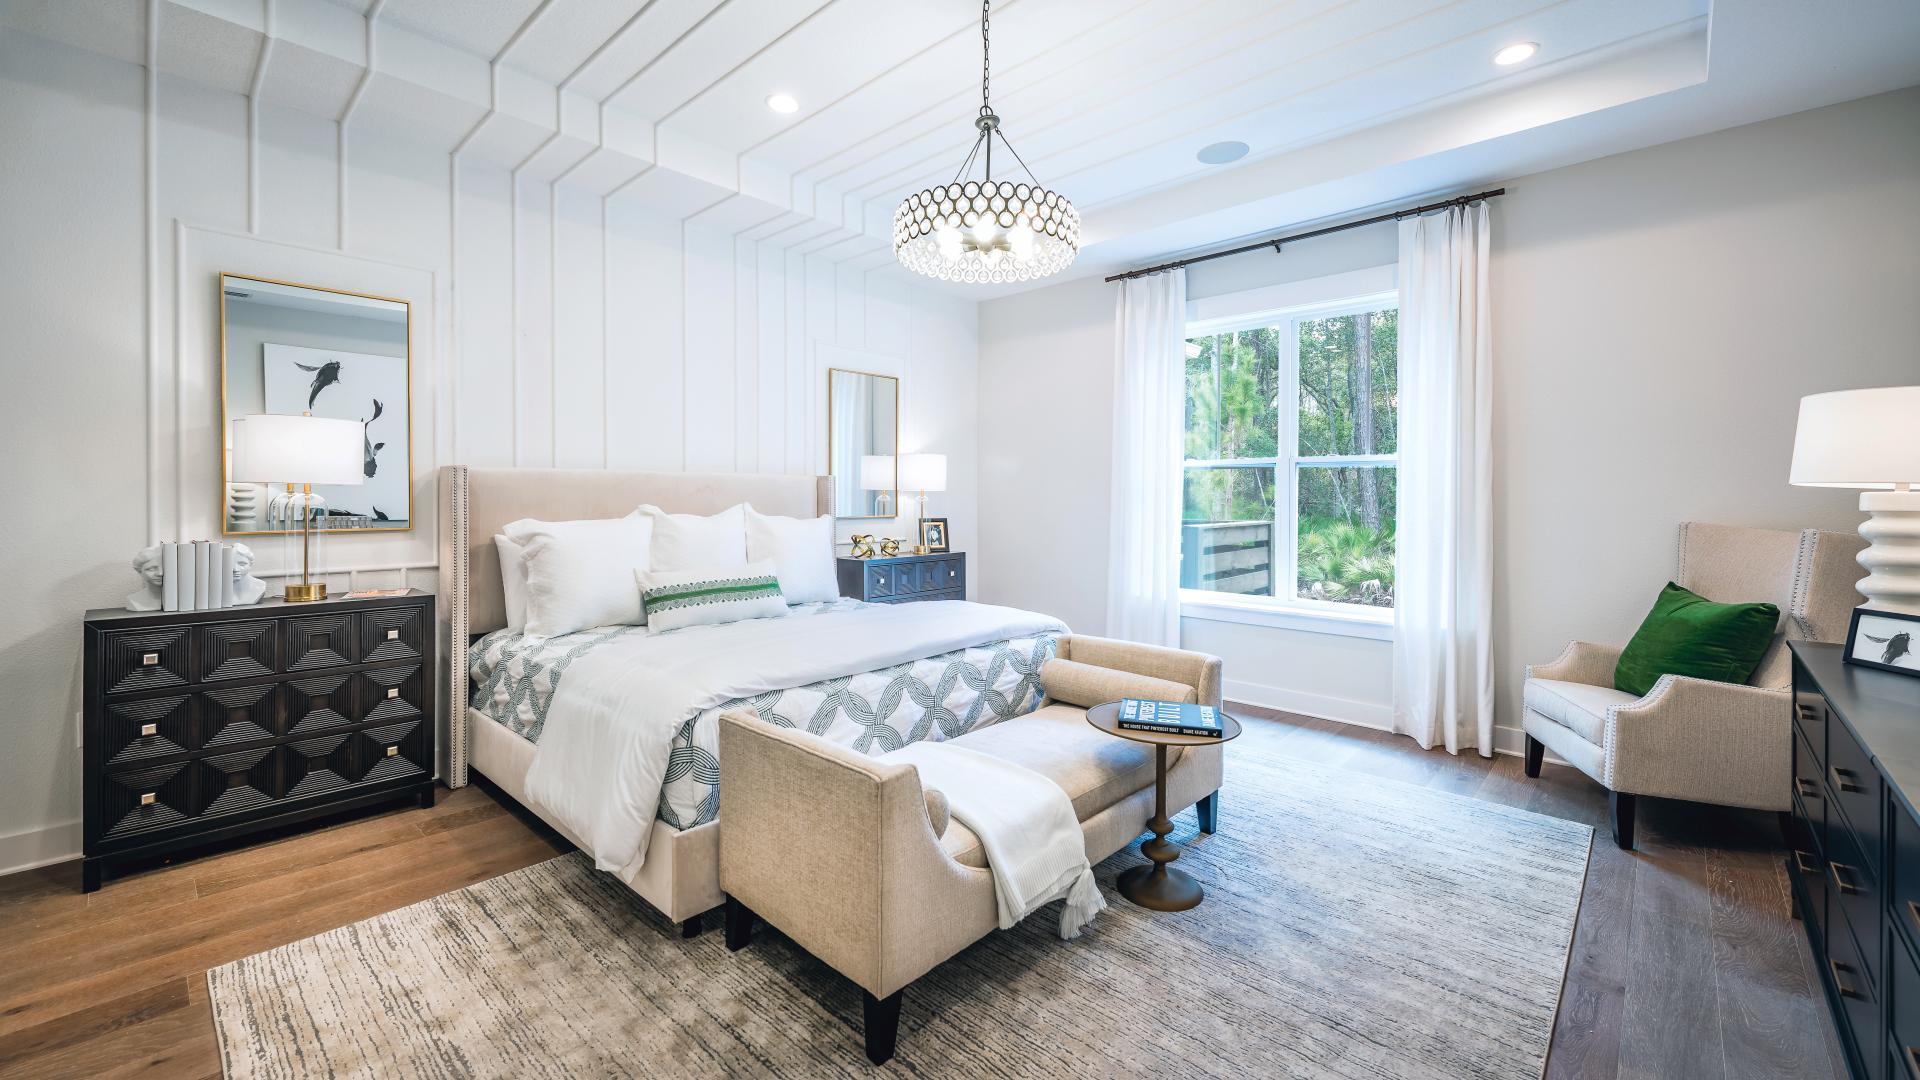 Luxurious primary bedroom suites